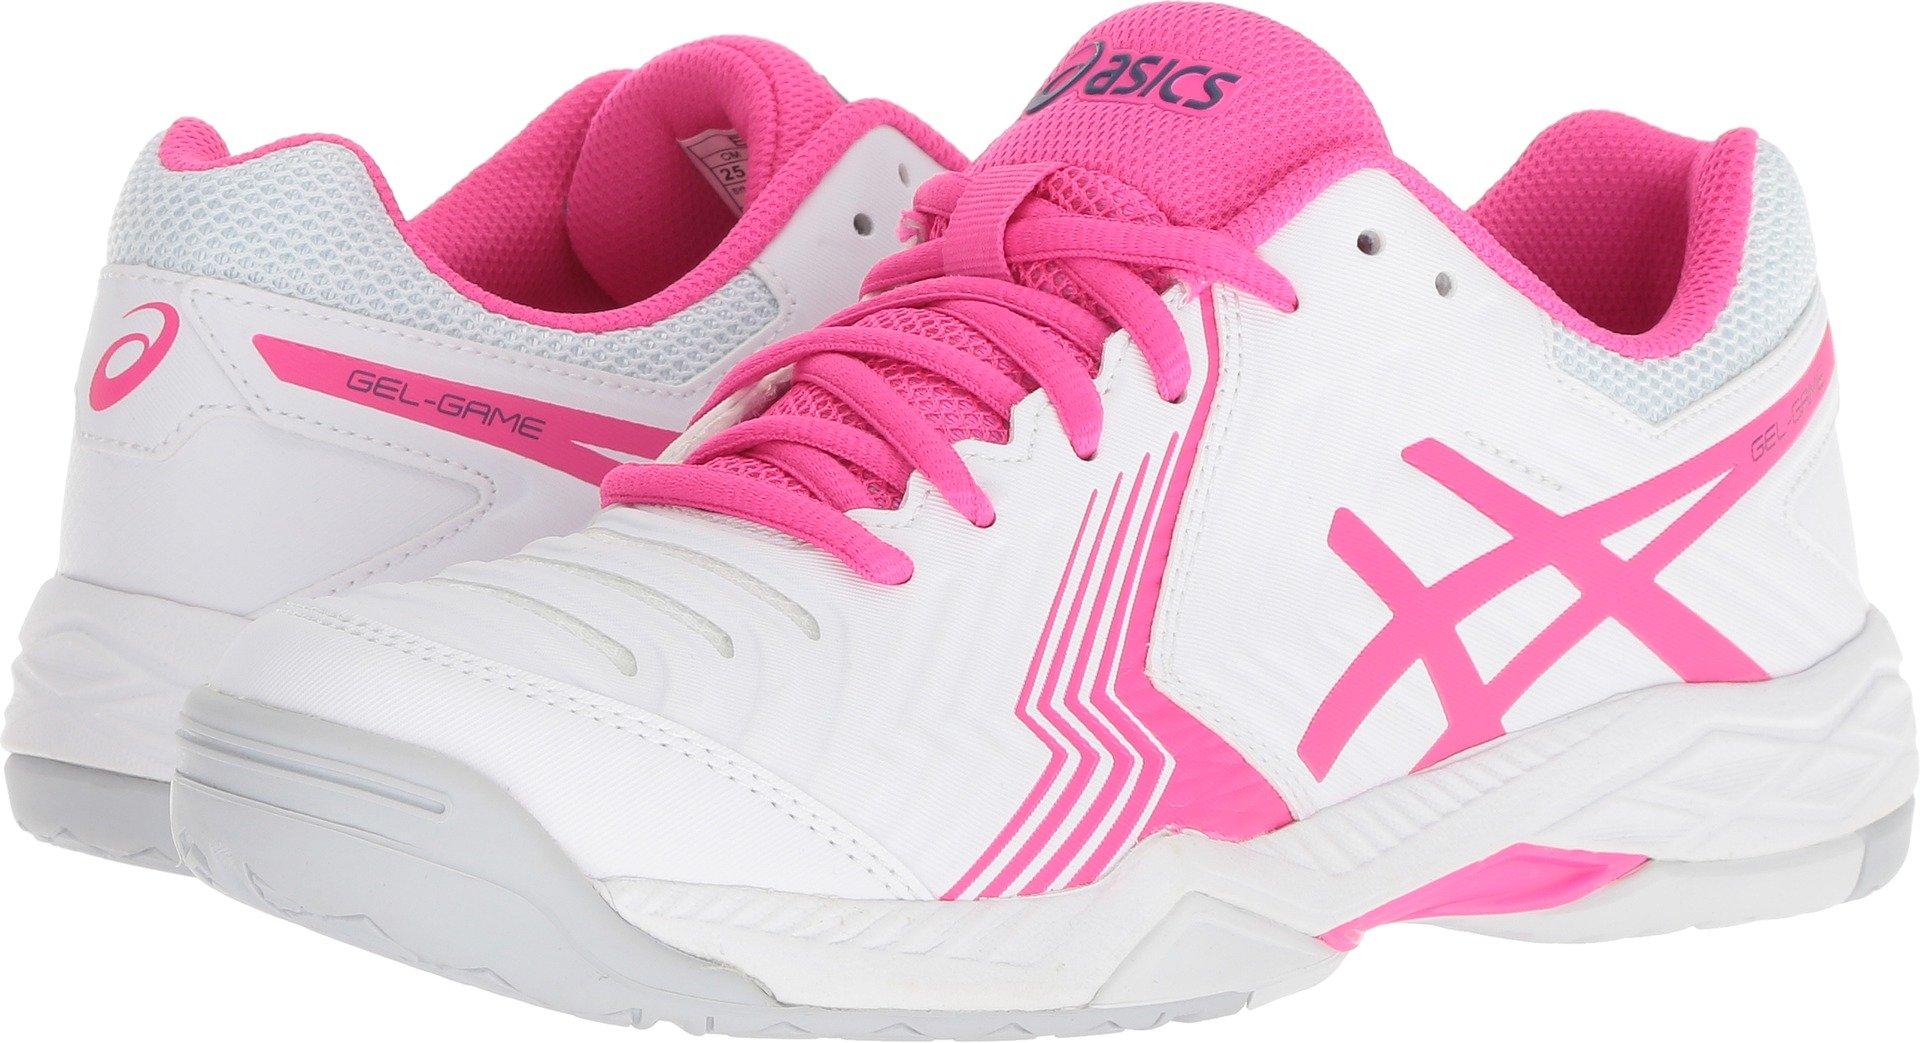 ASICS E755Y Women's Gel-Game 6 Tennis Shoe, White/Pink Glo - 8.5 B(M) US